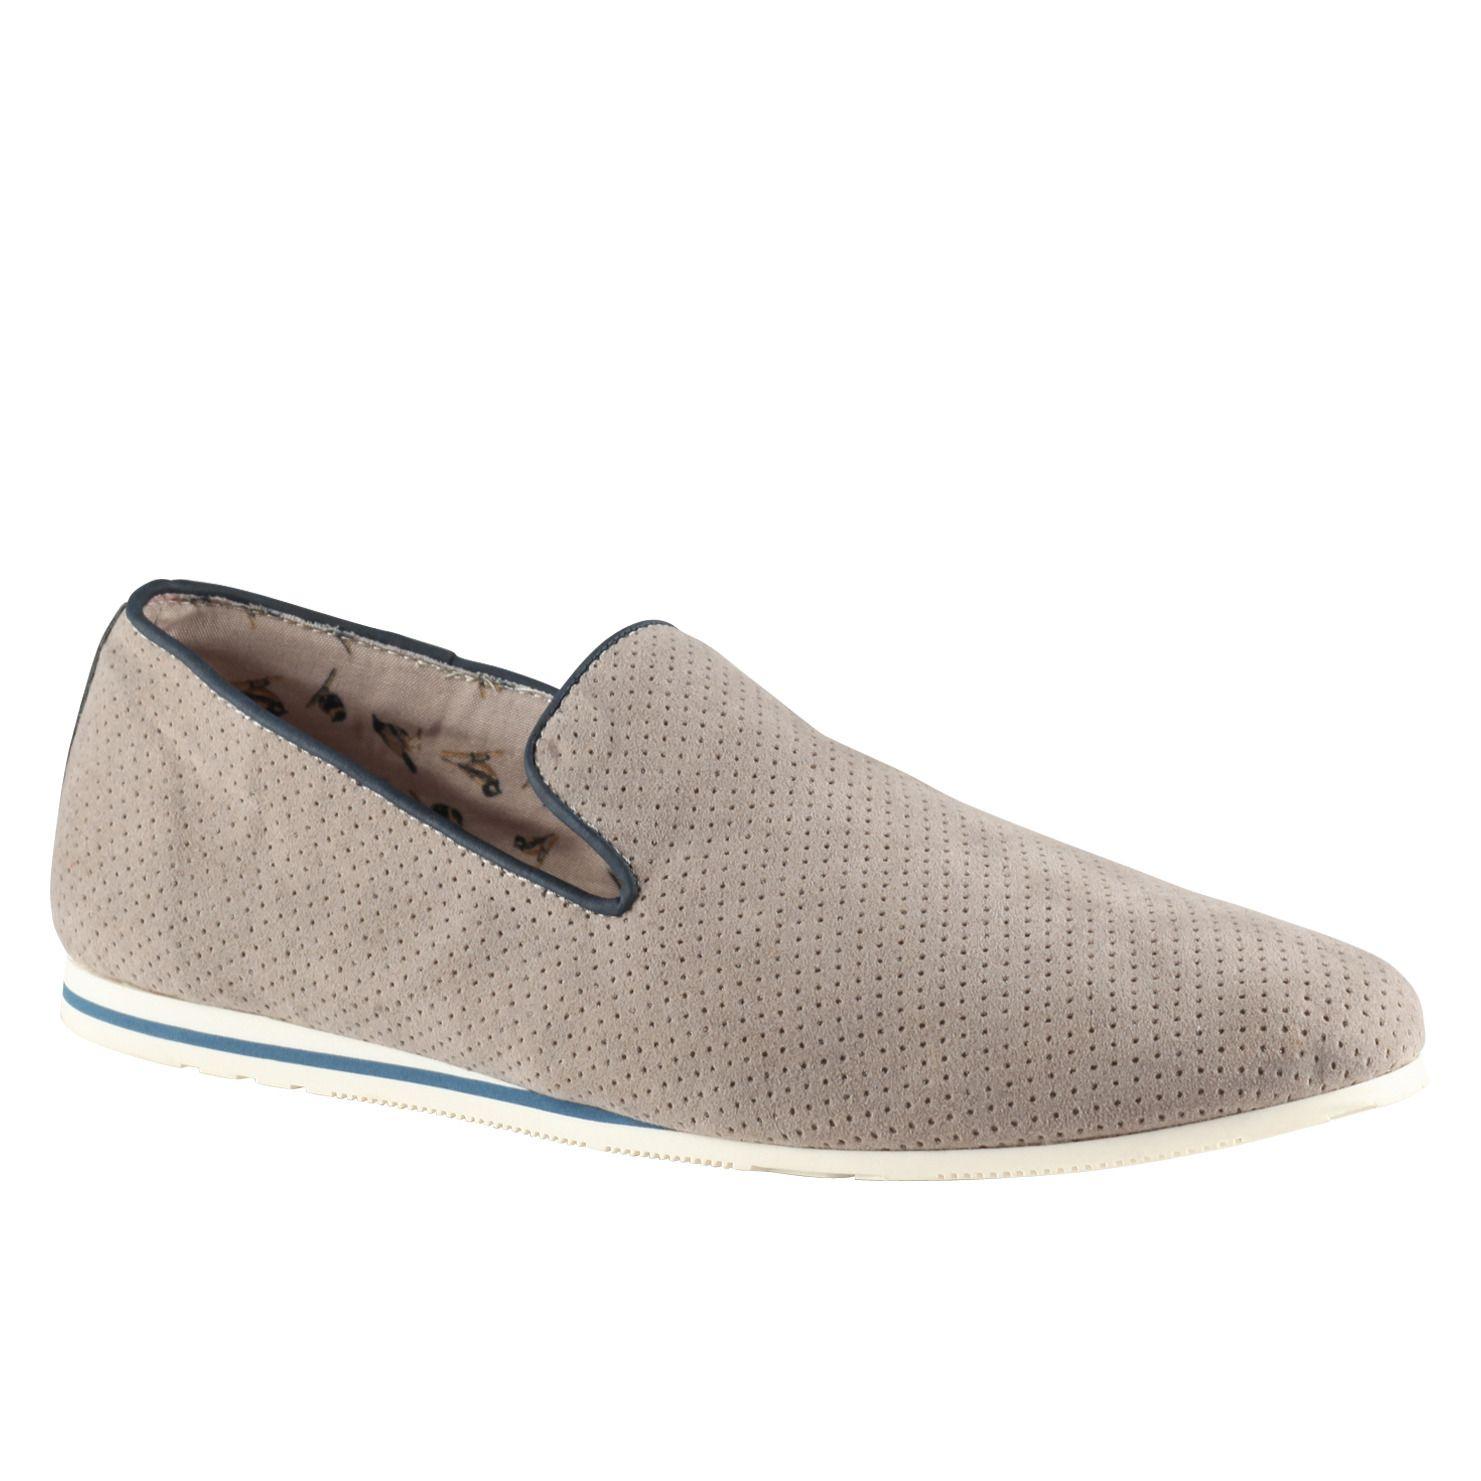 men's slip-ons shoes for sale at ALDO